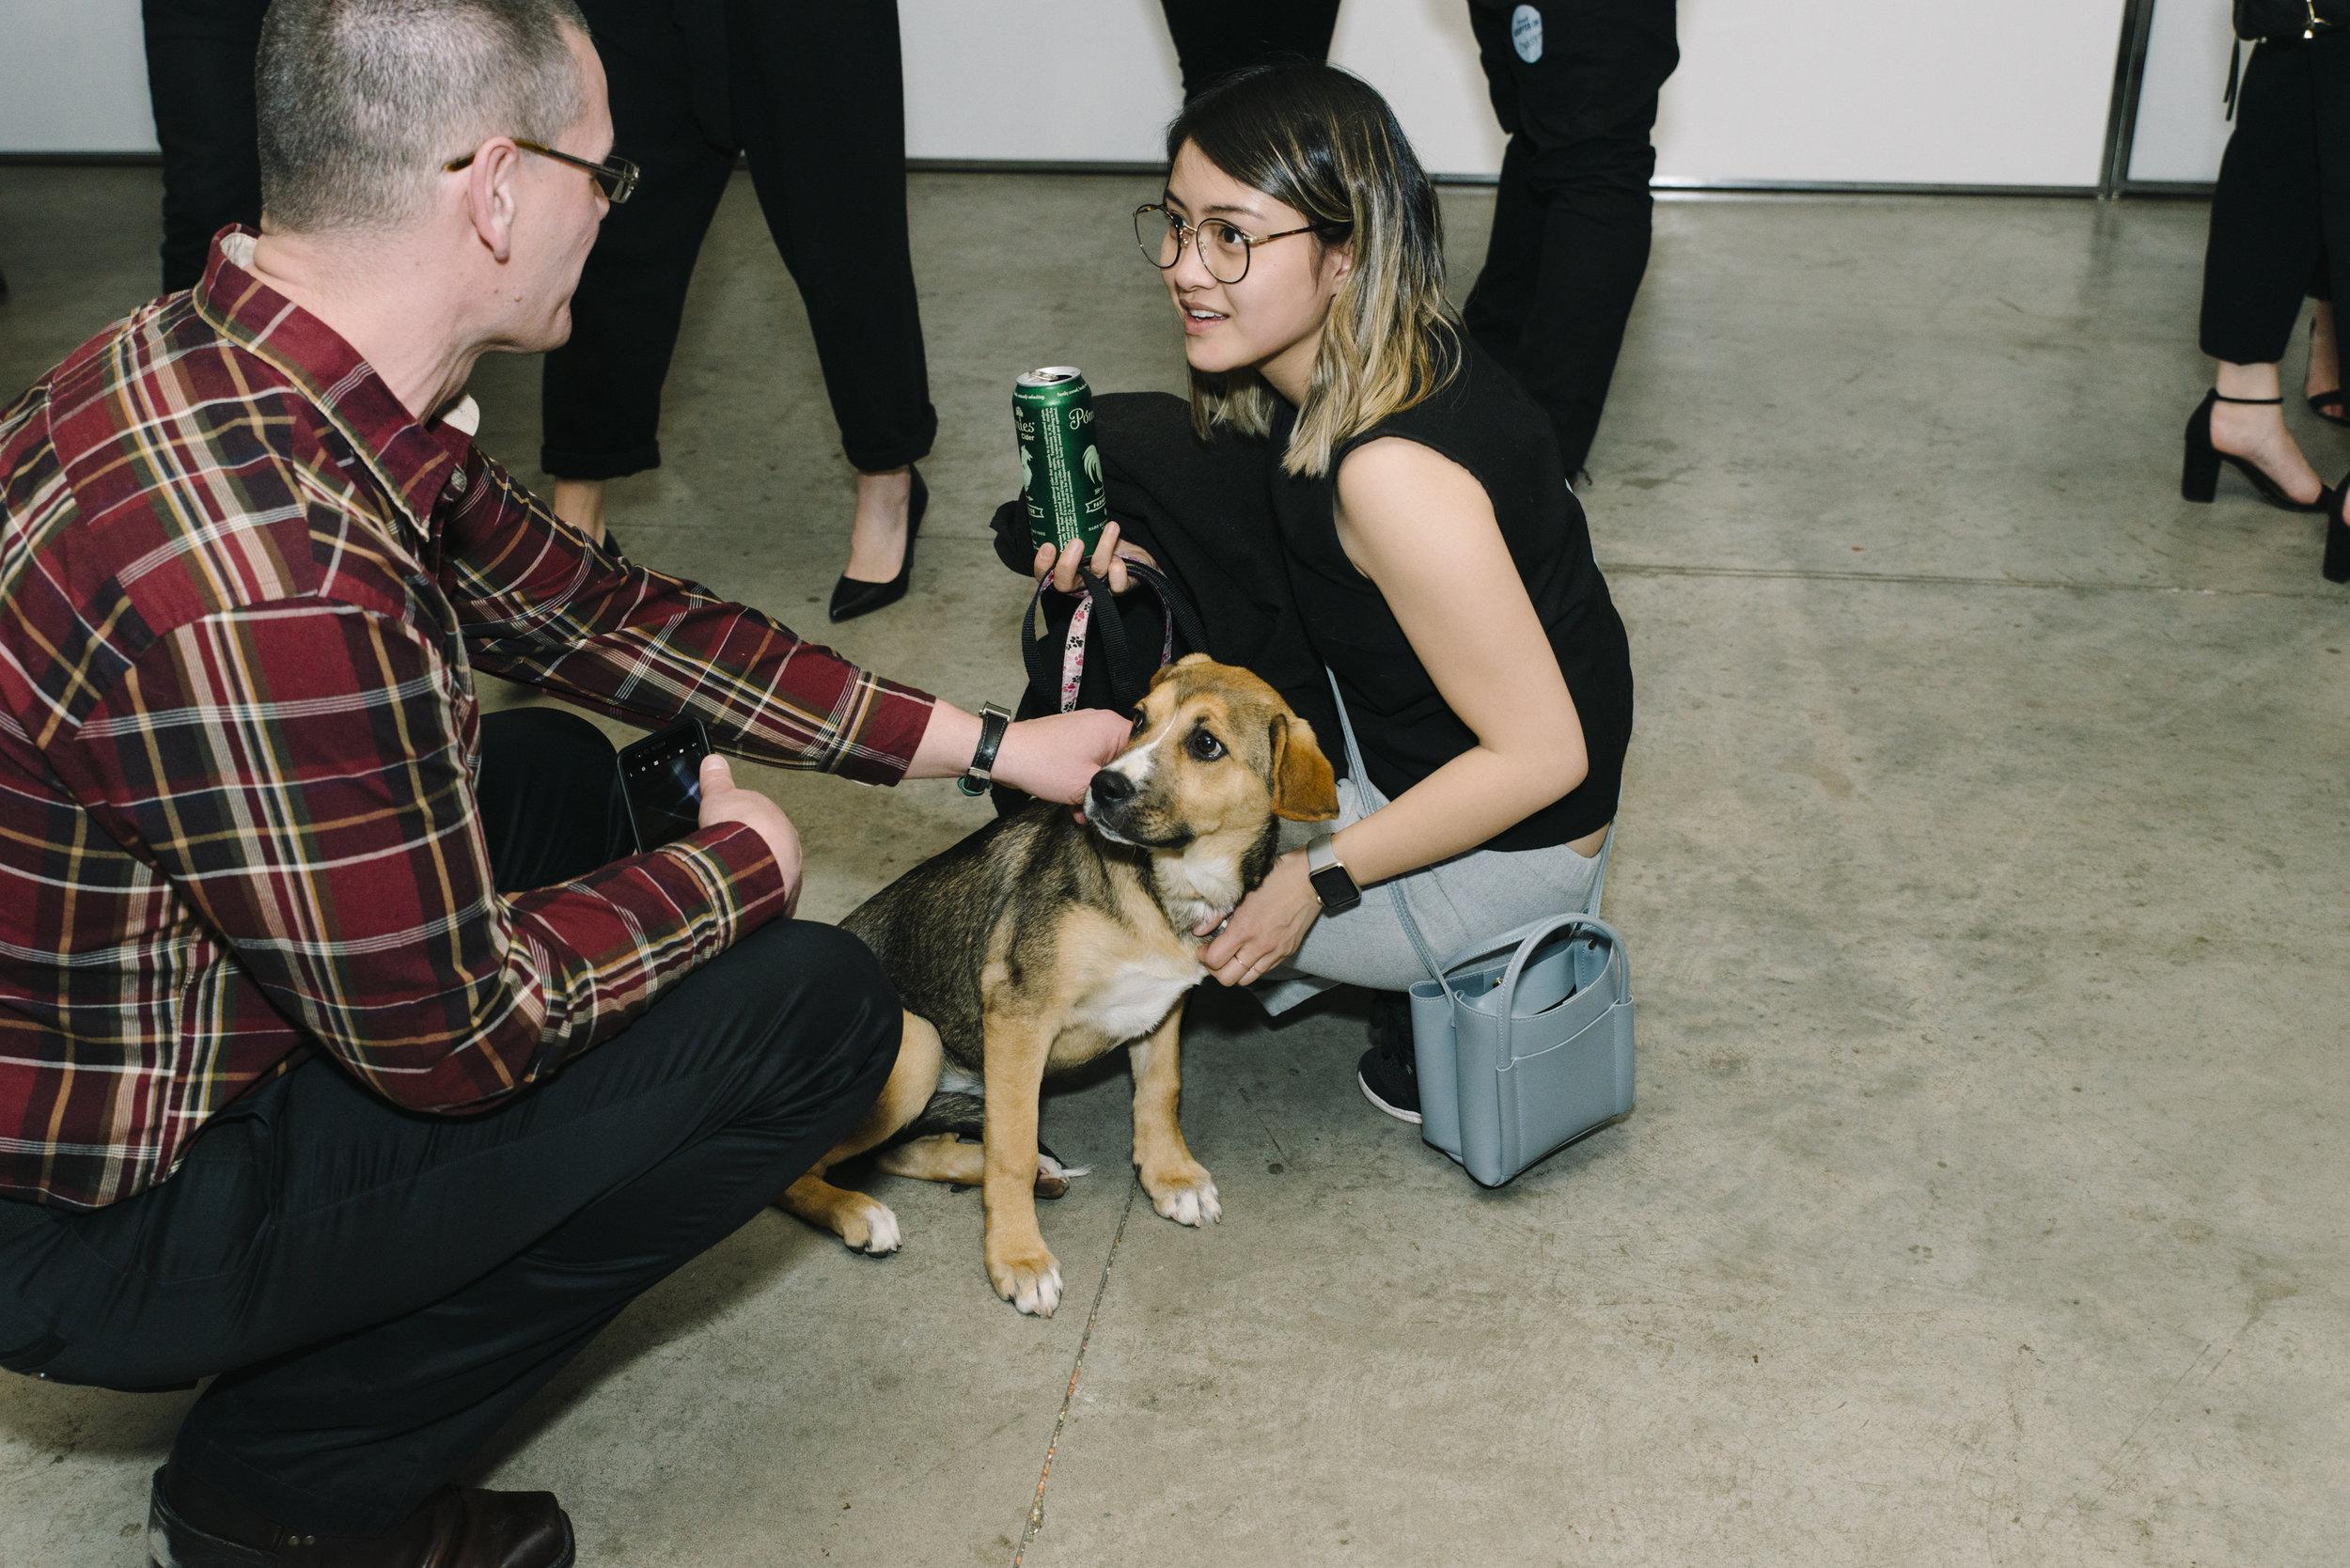 StefEthan-SaveOurScruff-ScruffSocal-SOS-DogRescue-District28Events-D28-TorontoEventPhotographer-Event-SOSDogRescue-41.JPG